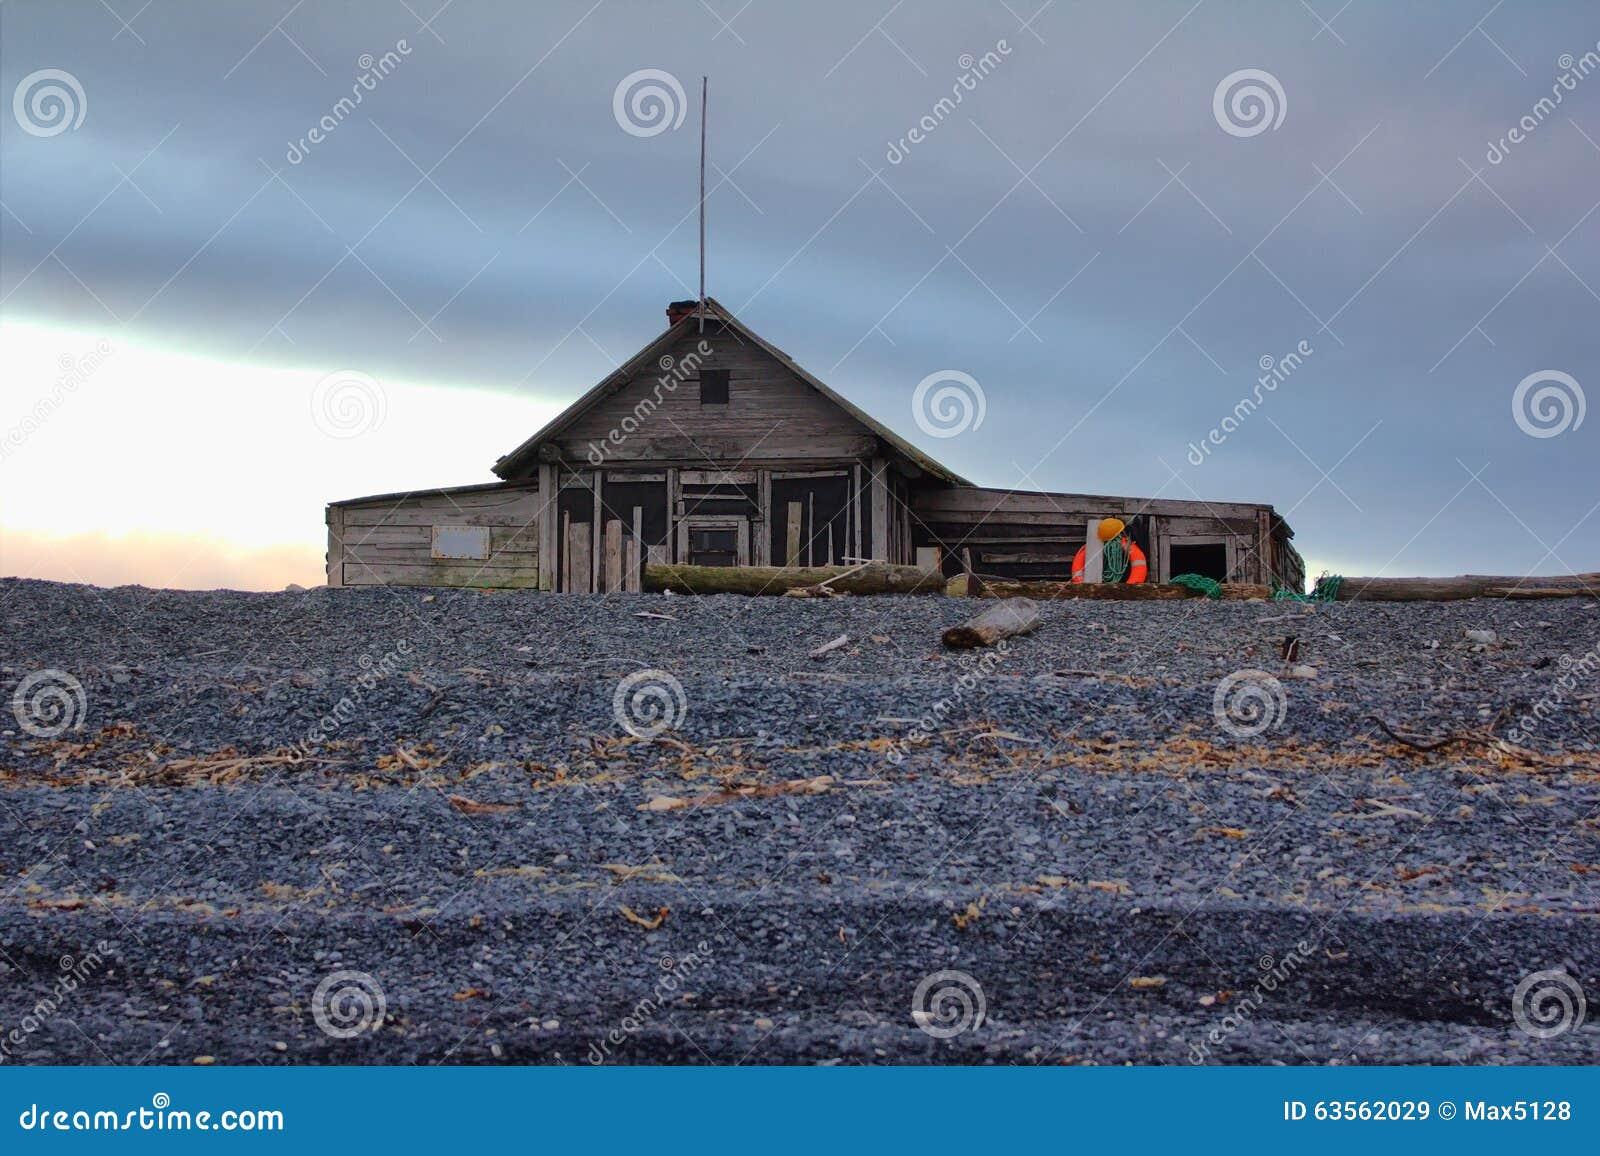 pt guests snowy moss shores meet cabins landing flight ocean sp owl takes owls in damon